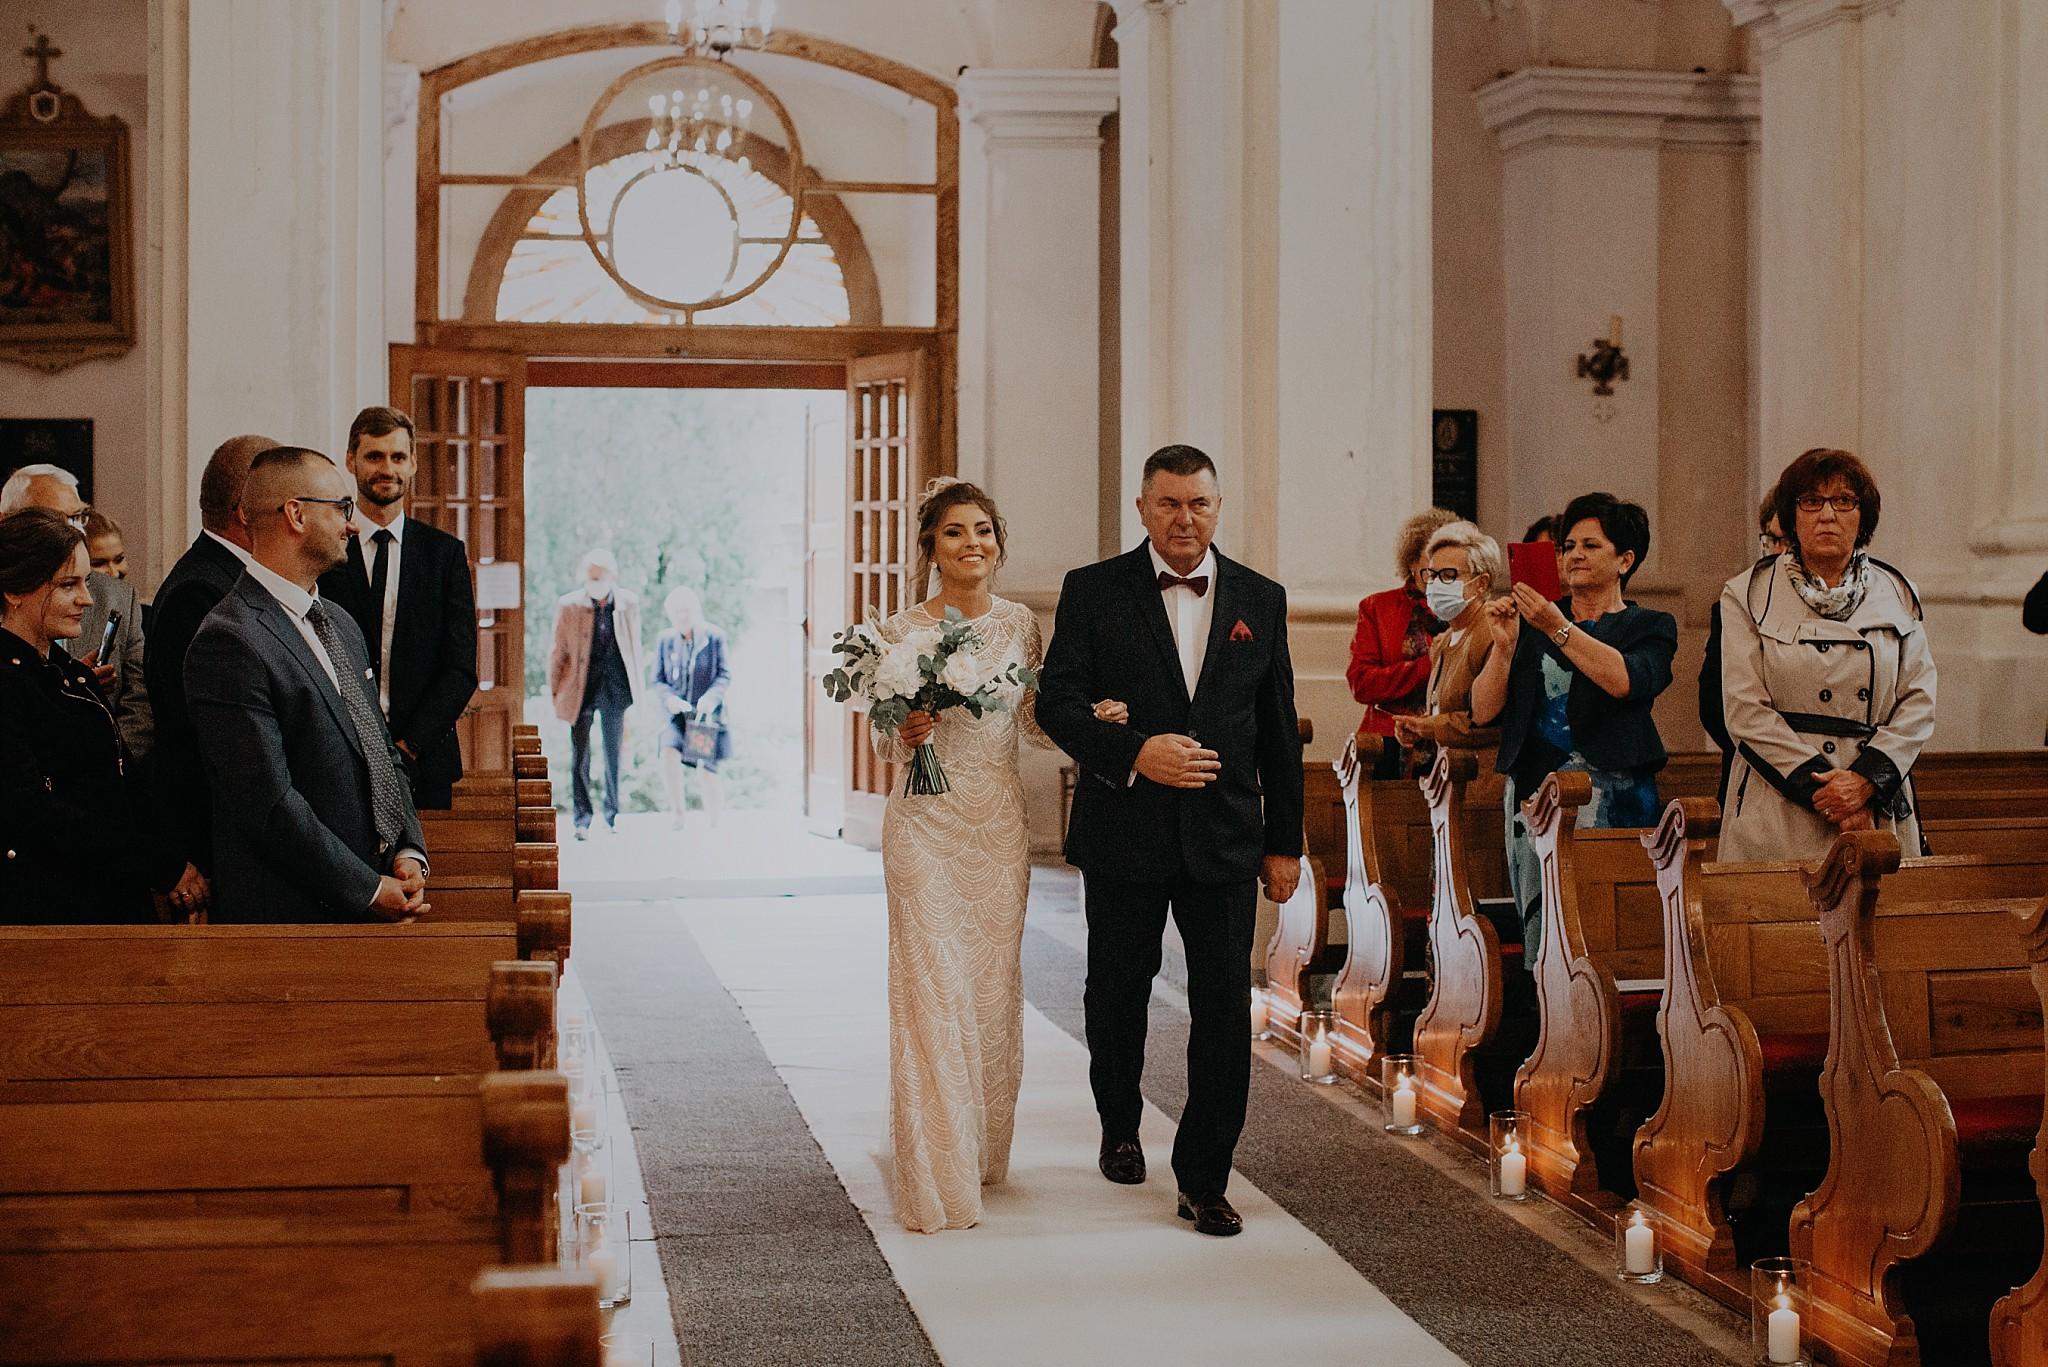 fotograf poznan wesele dobra truskawka piekne wesele pod poznaniem wesele w dobrej truskawce piekna para mloda slub marzen slub koronawirus slub listopad wesele koronawirus 151